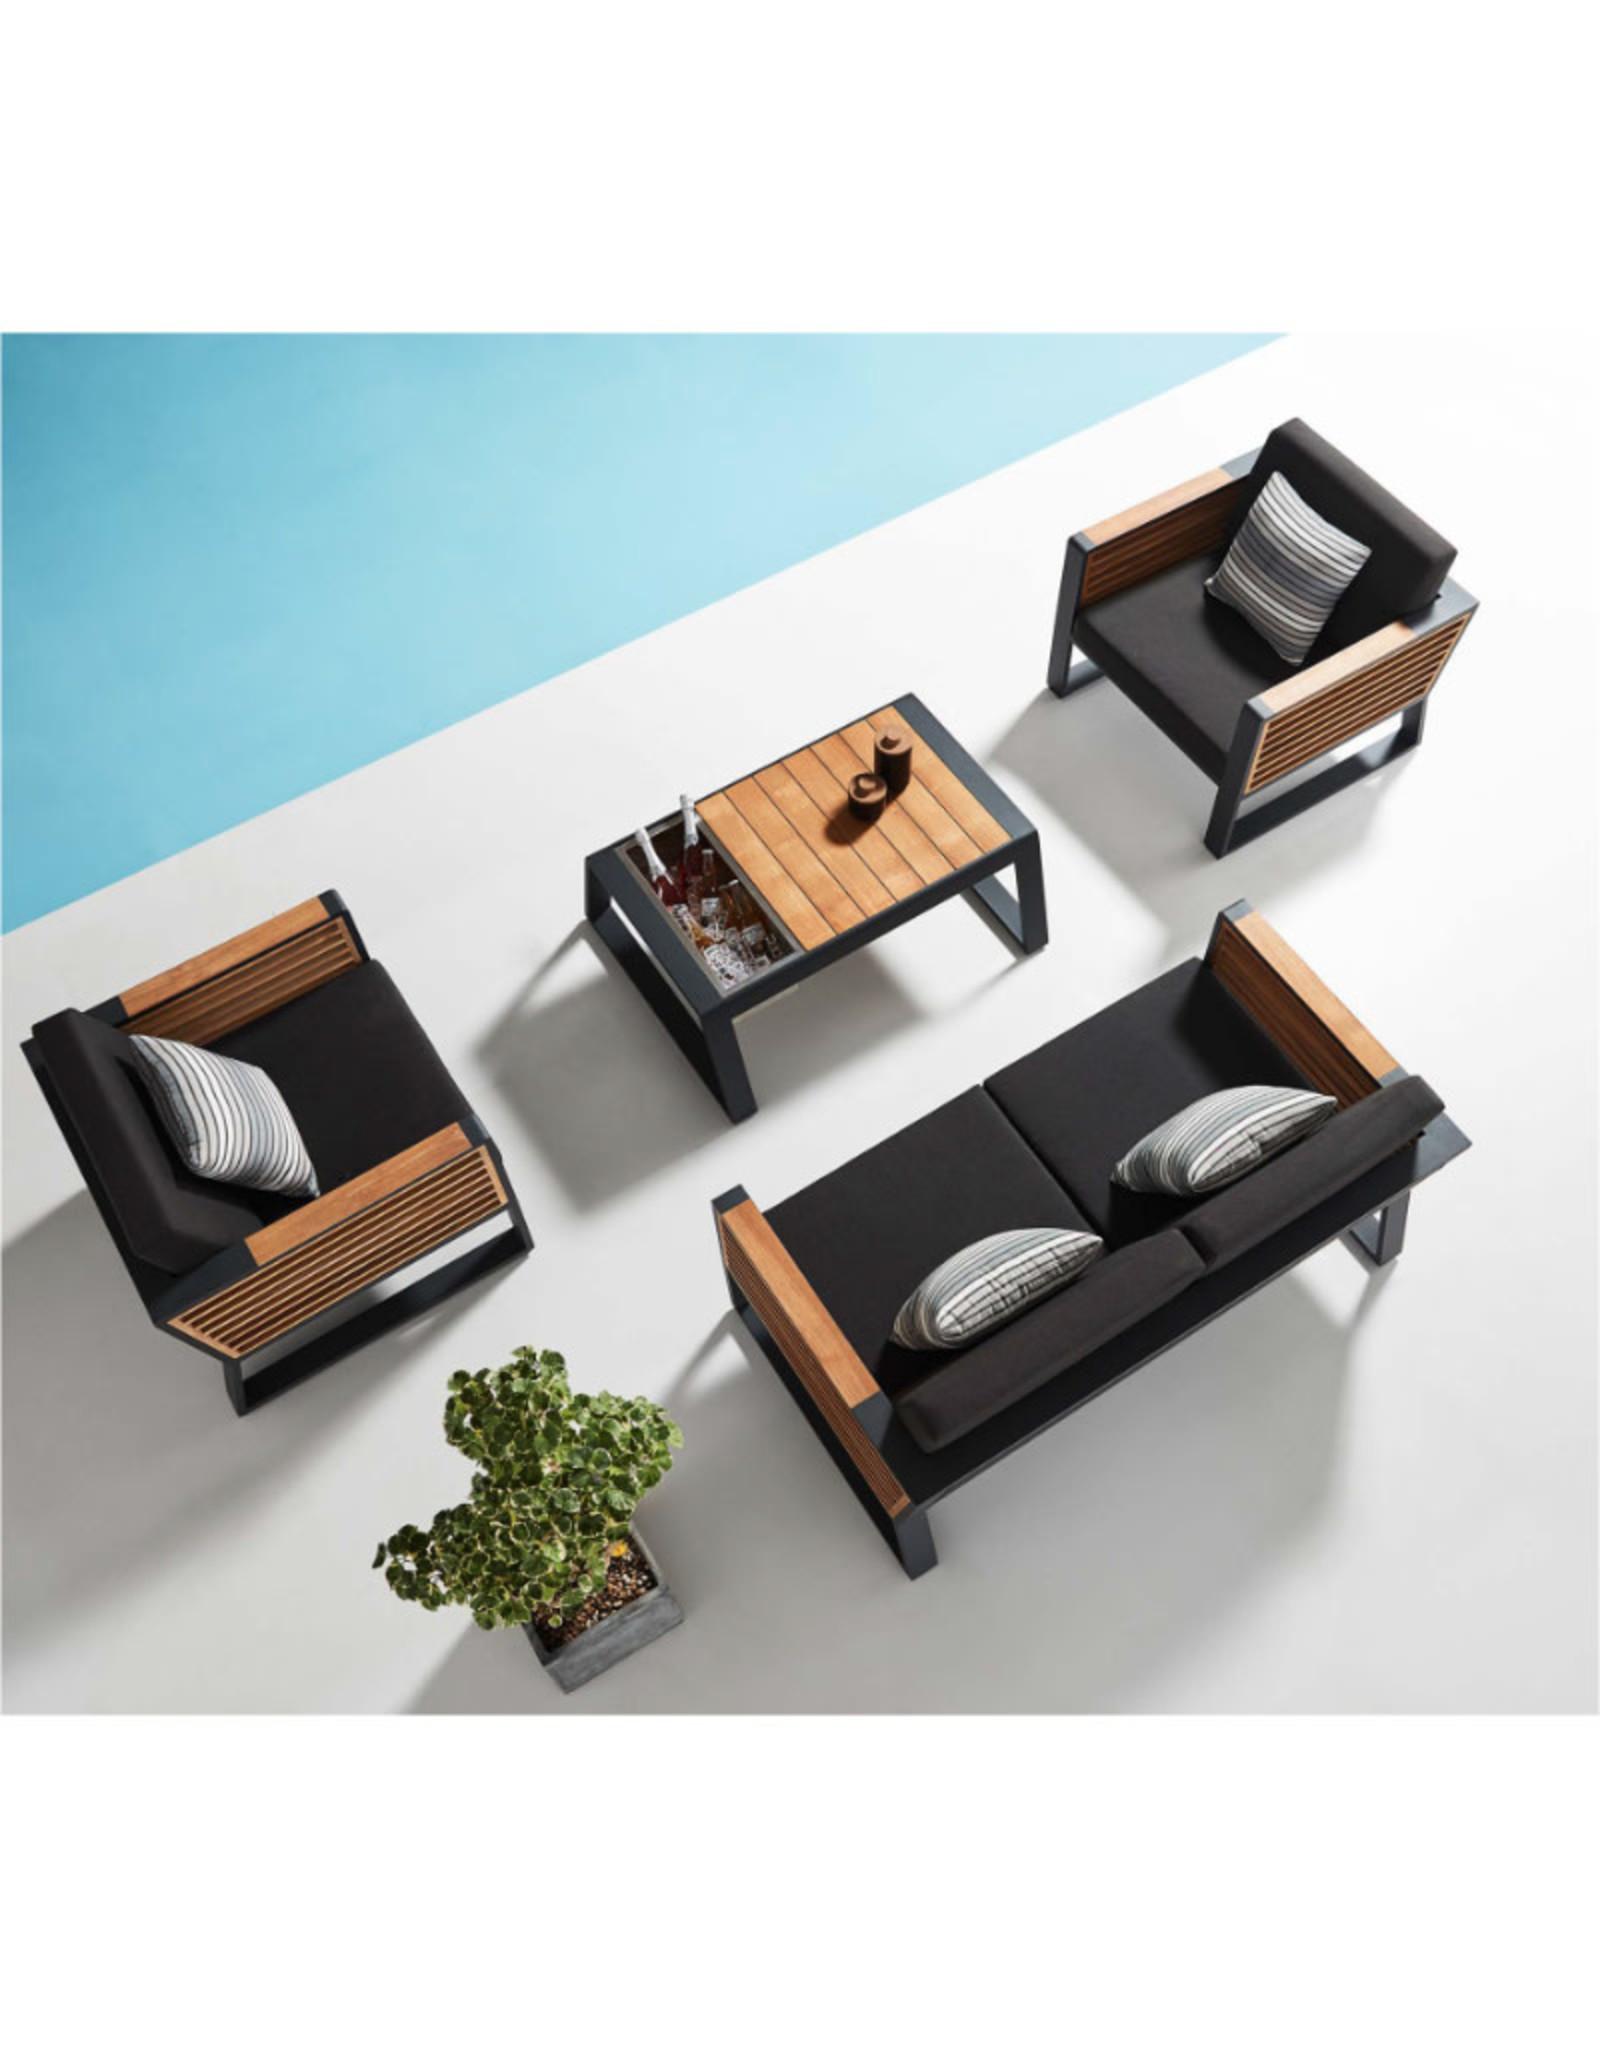 Higold Higold New York Two-seater sofa set 4dlg zwart/teak